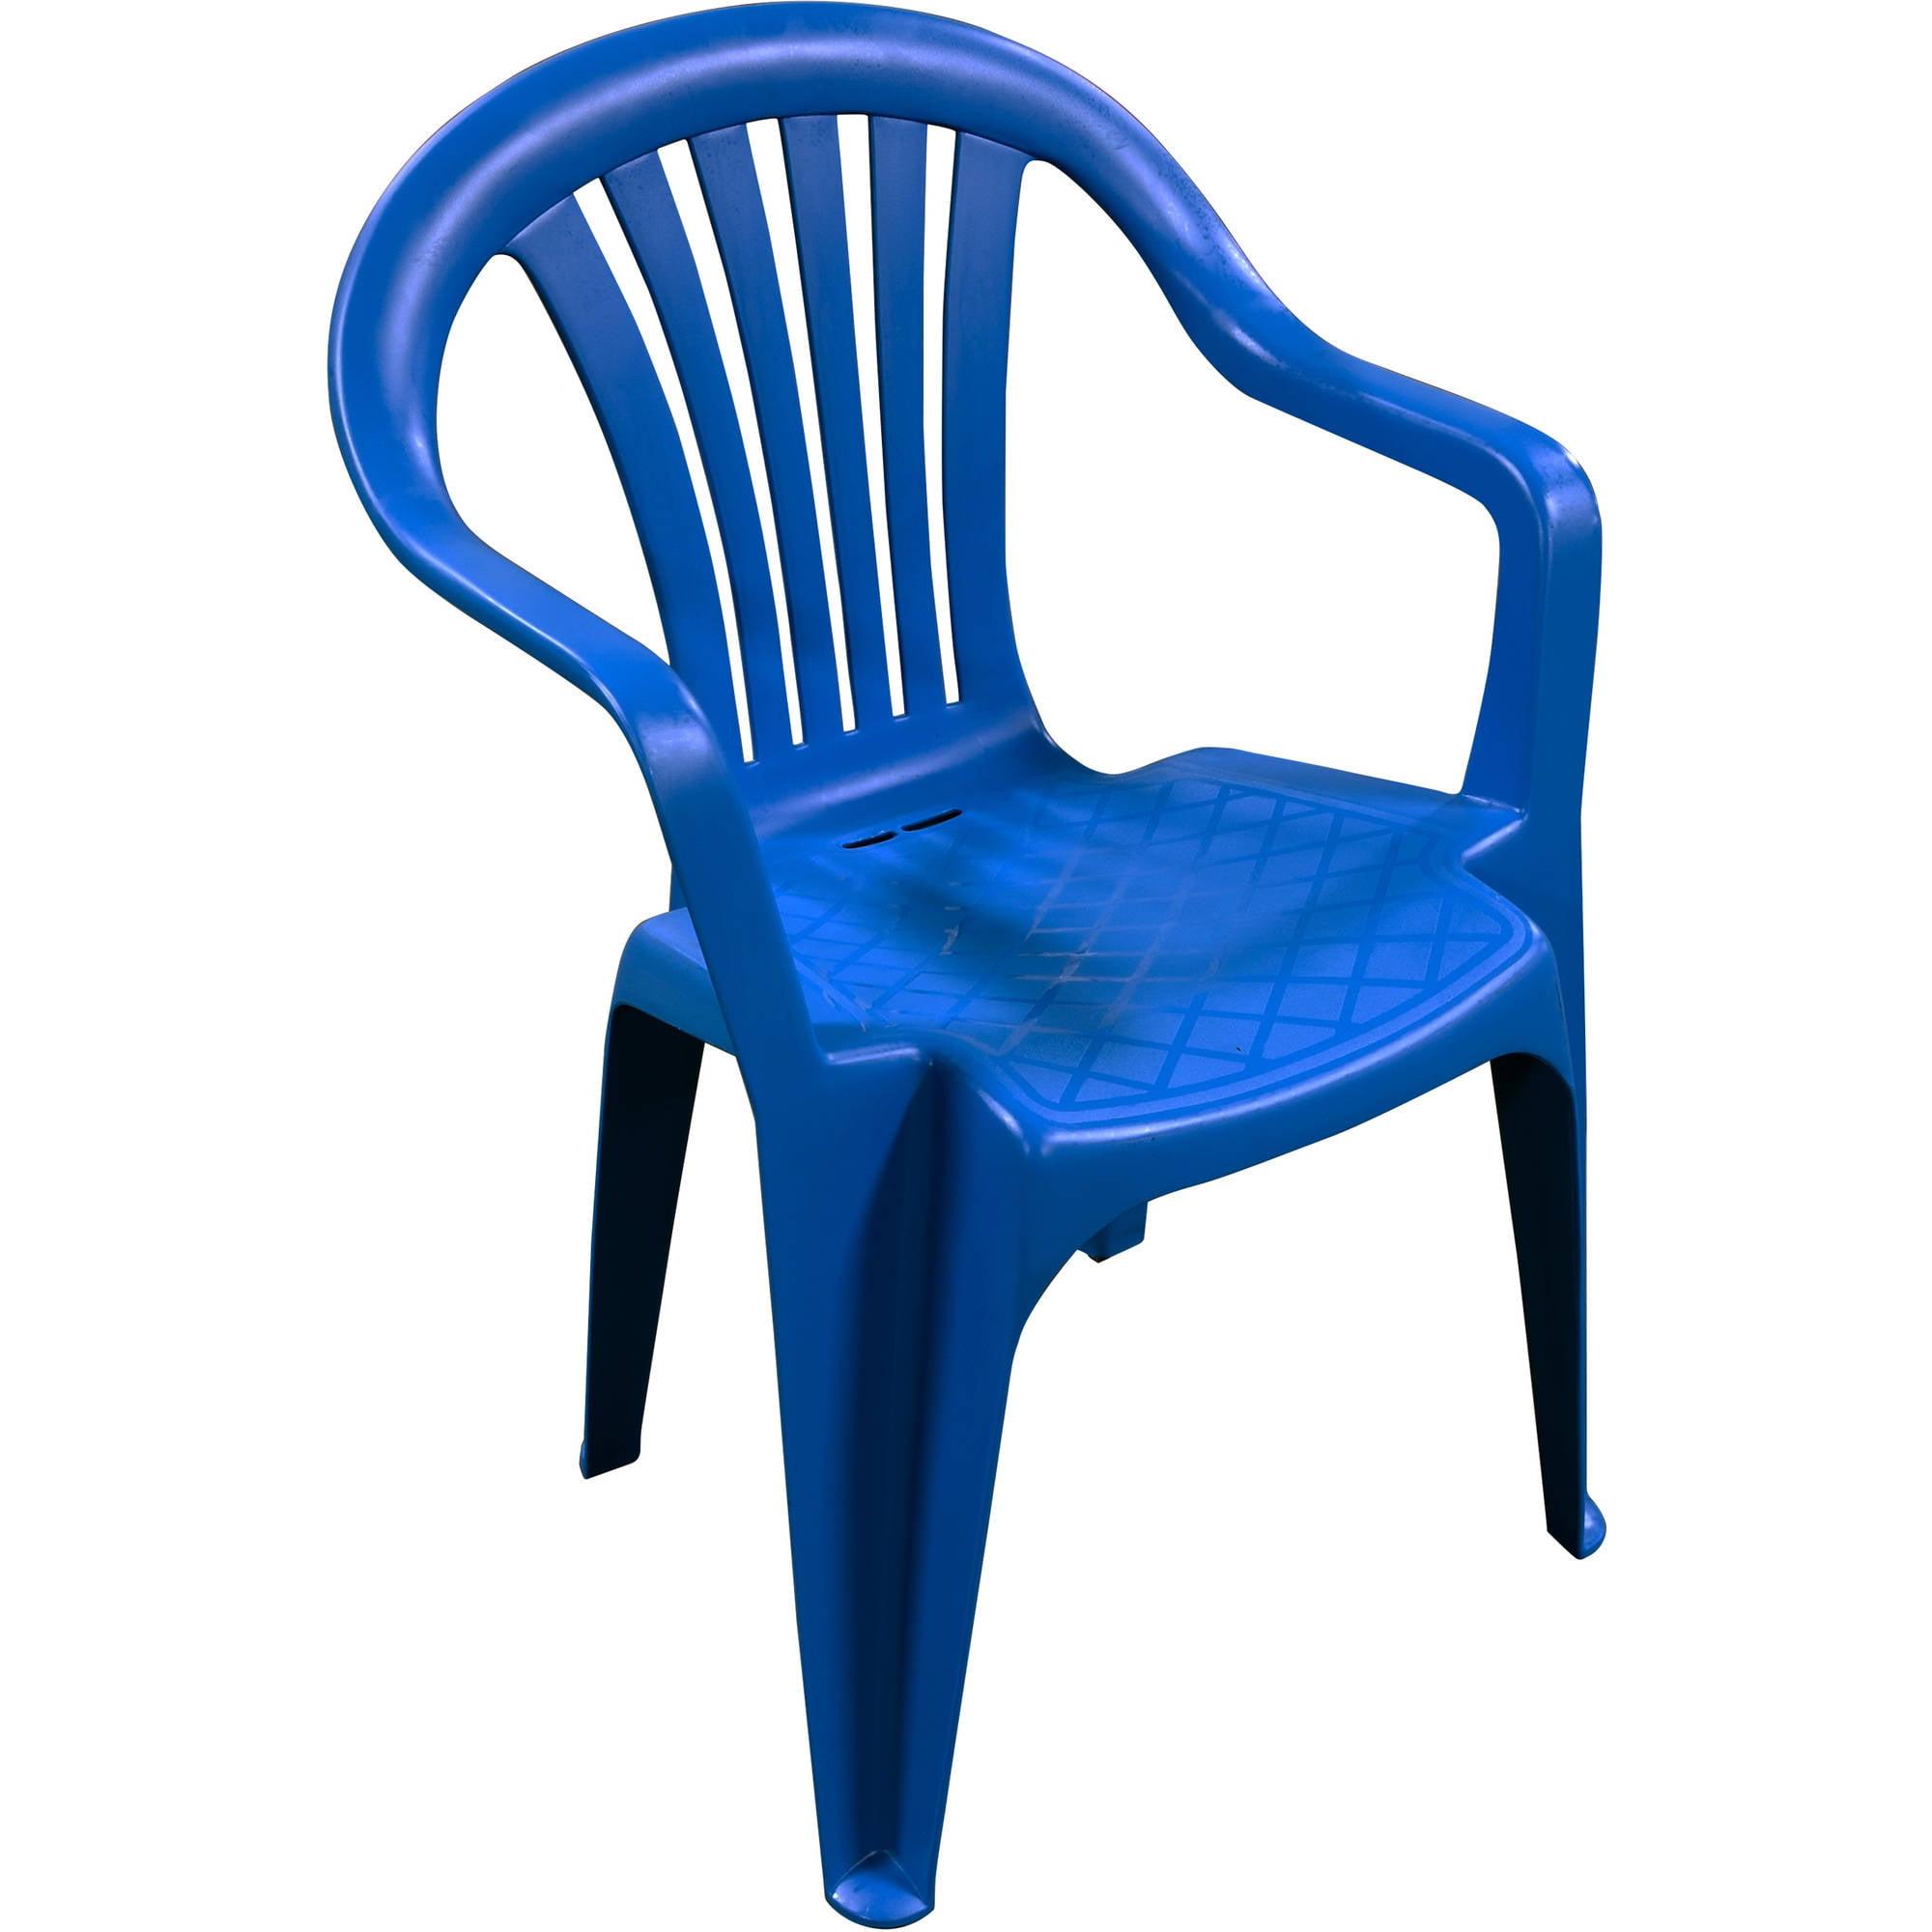 Adams Manufacturing Low Back Chair, Patriotic Blue